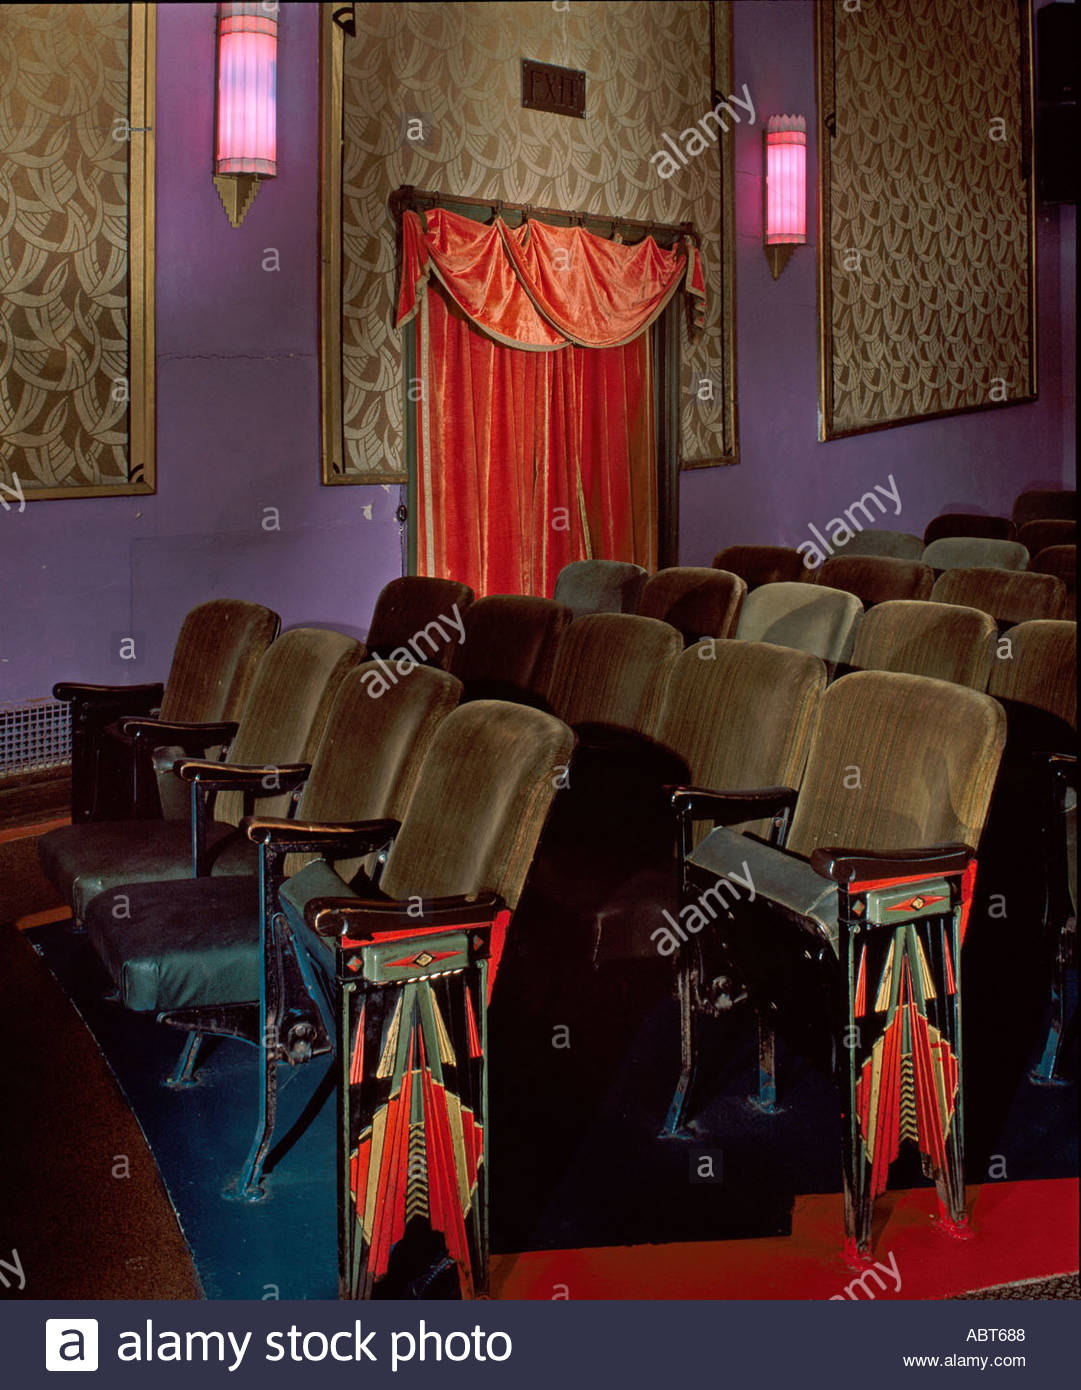 The Criterion Theater, Bar Harbor, Maine, 1932. Interior. - Stock Image